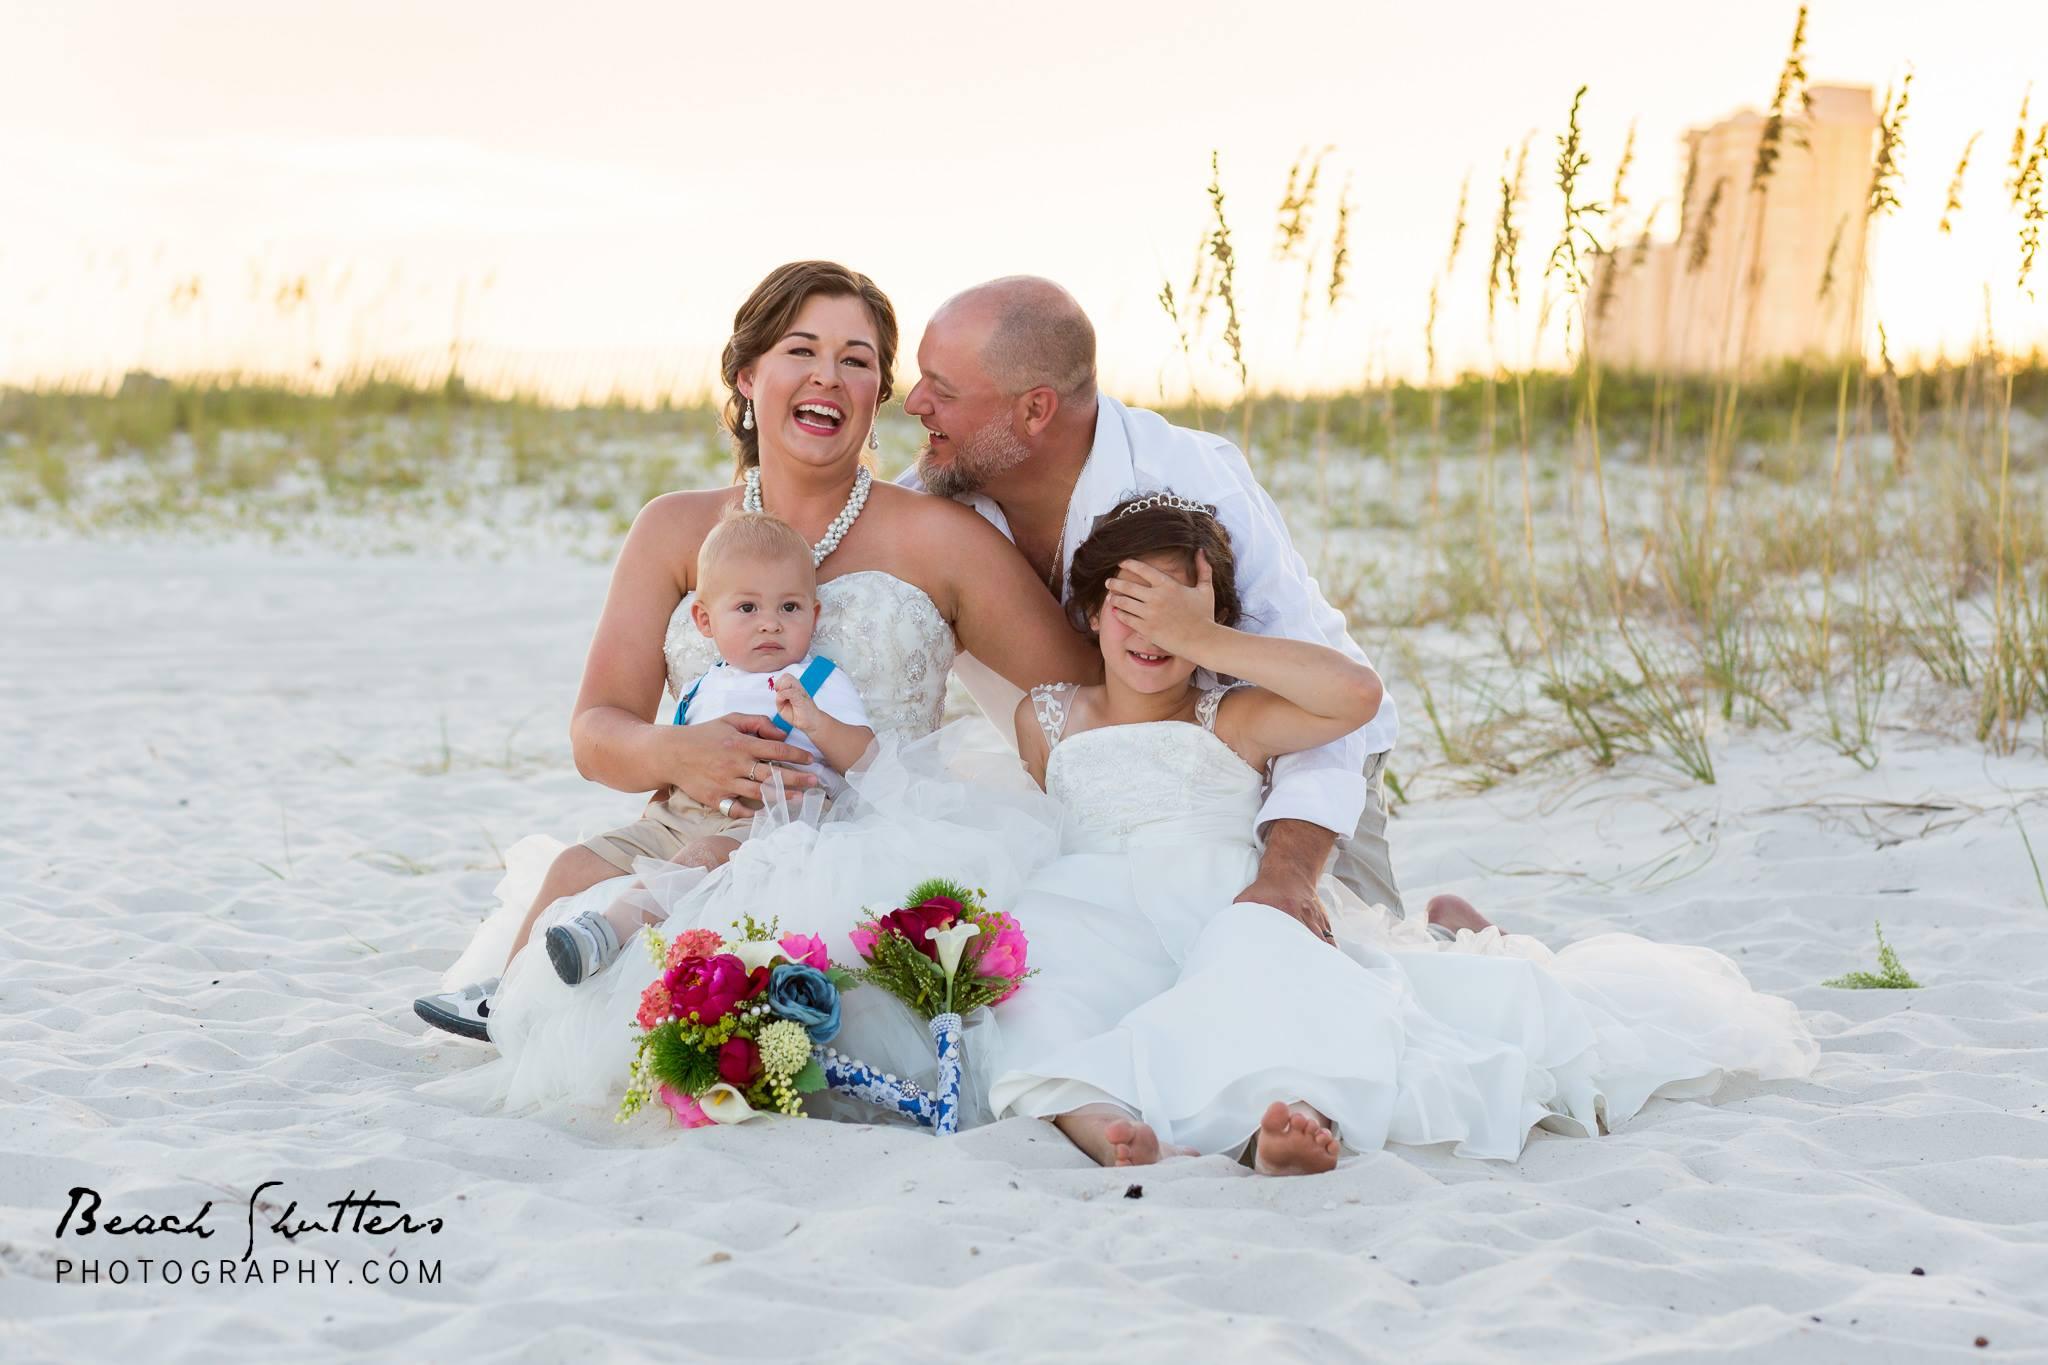 Wedding day in Orange Beach at Perdido Beach Resort photography by Beach Shutters